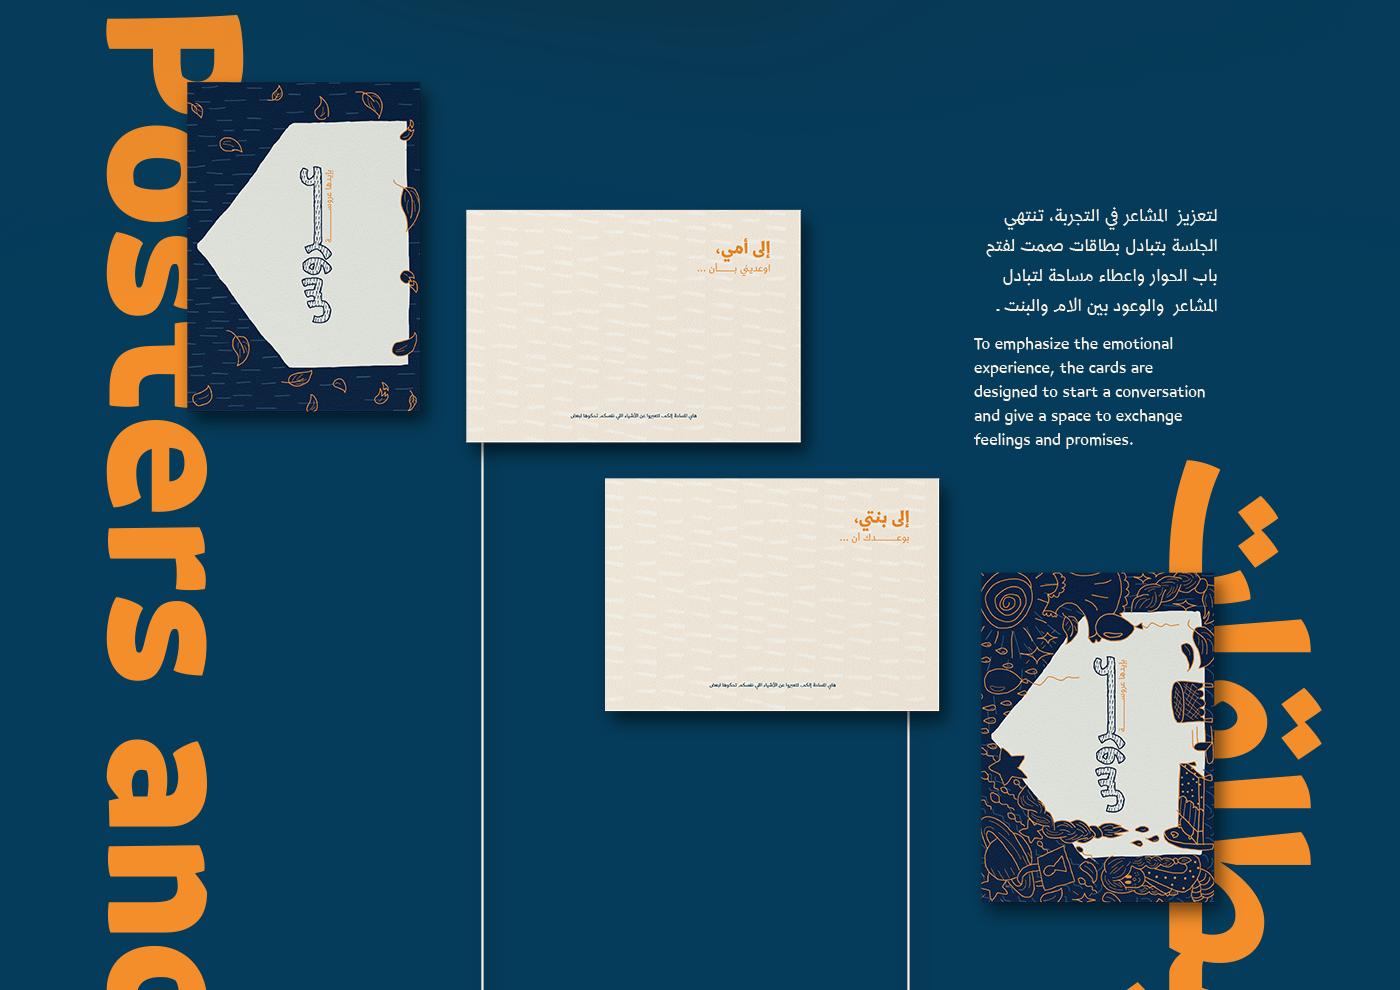 creative print book book design posters campaign ILLUSTRATION  psa Story telling design